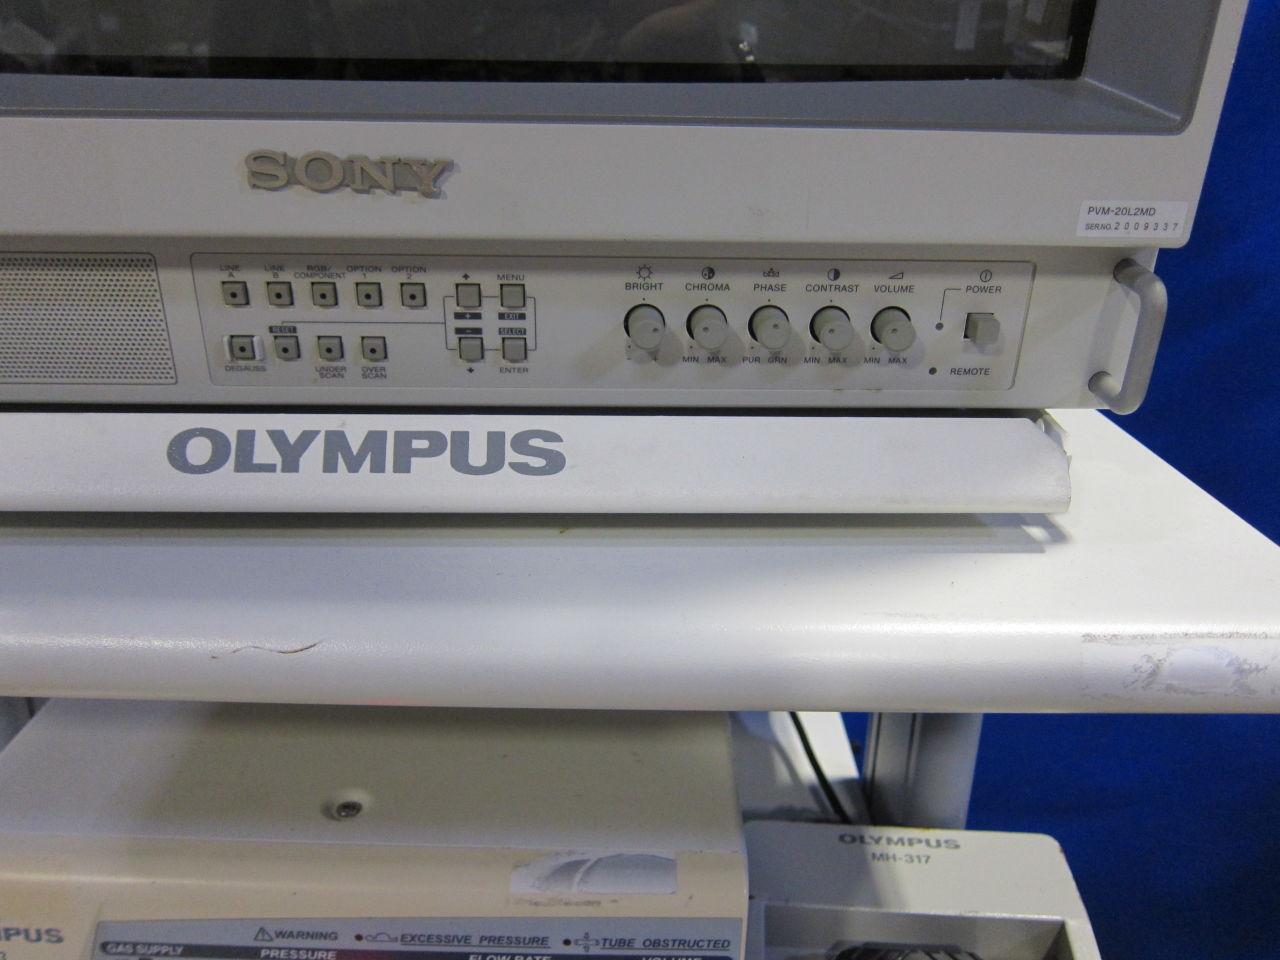 OLYMPUS/SONY Various Insufflator, Light Source, Monitor, Printer